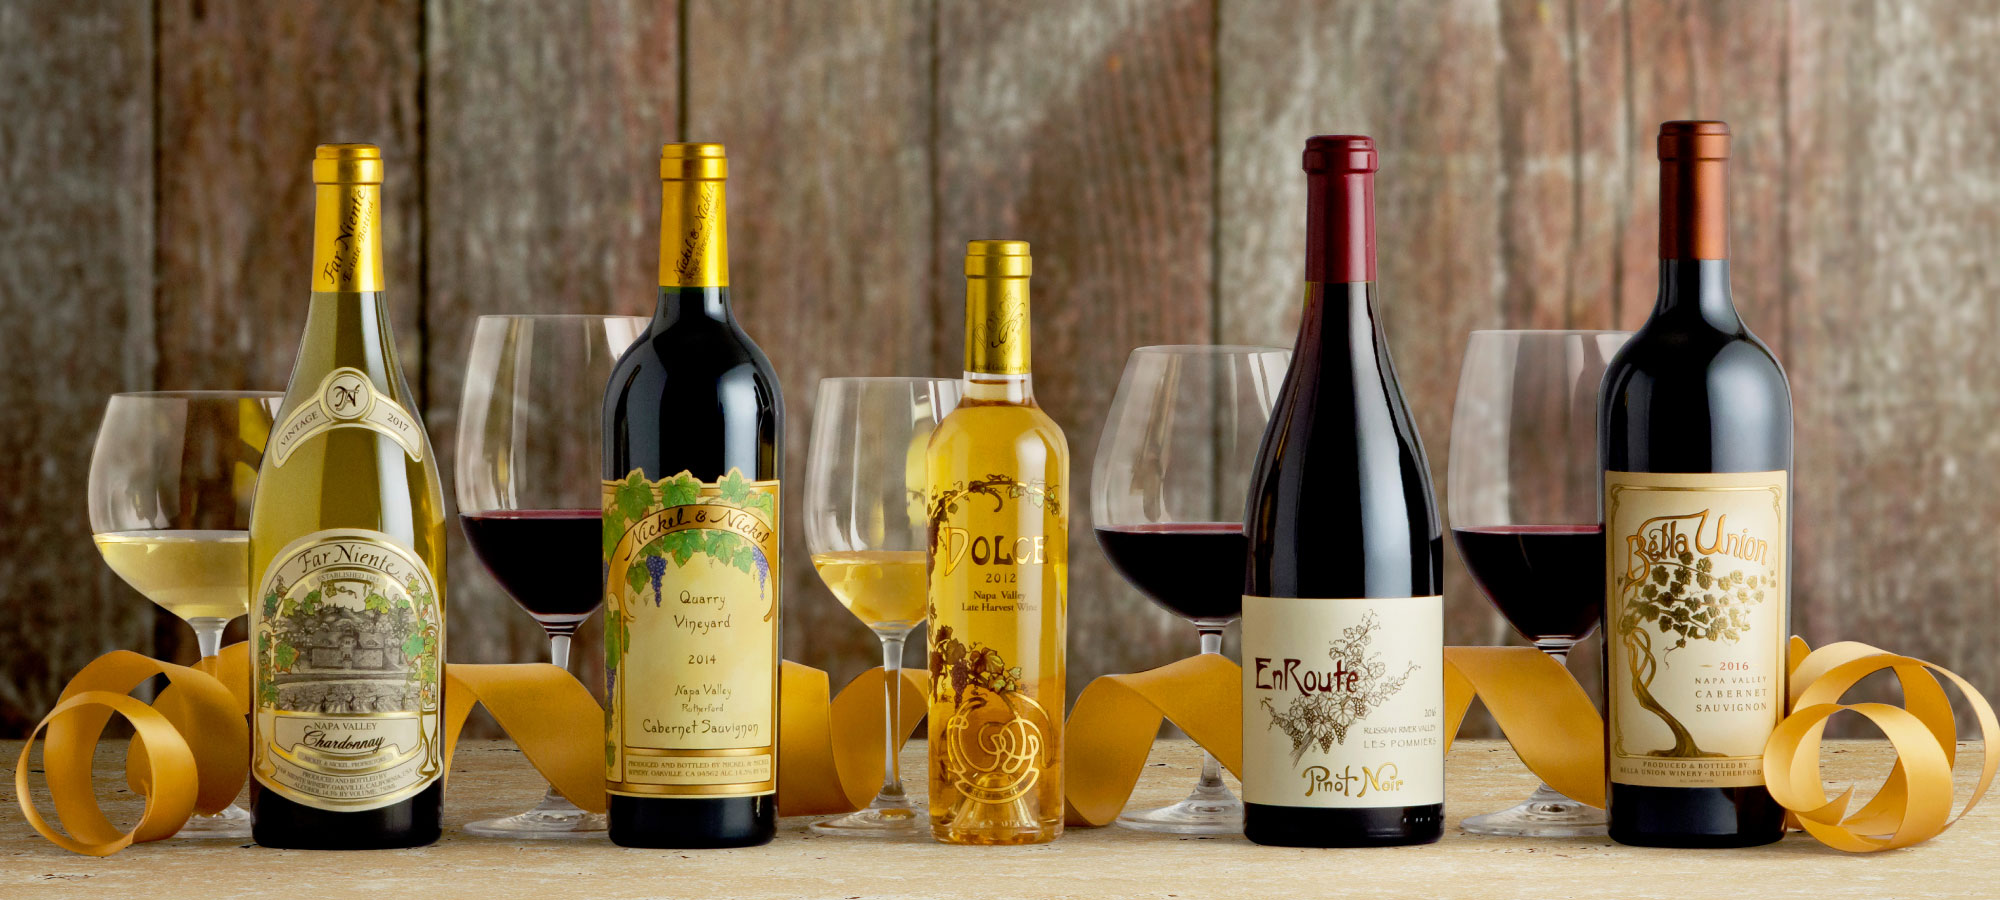 Napa Valley Wine Gifts Catalog | Far Niente Winery